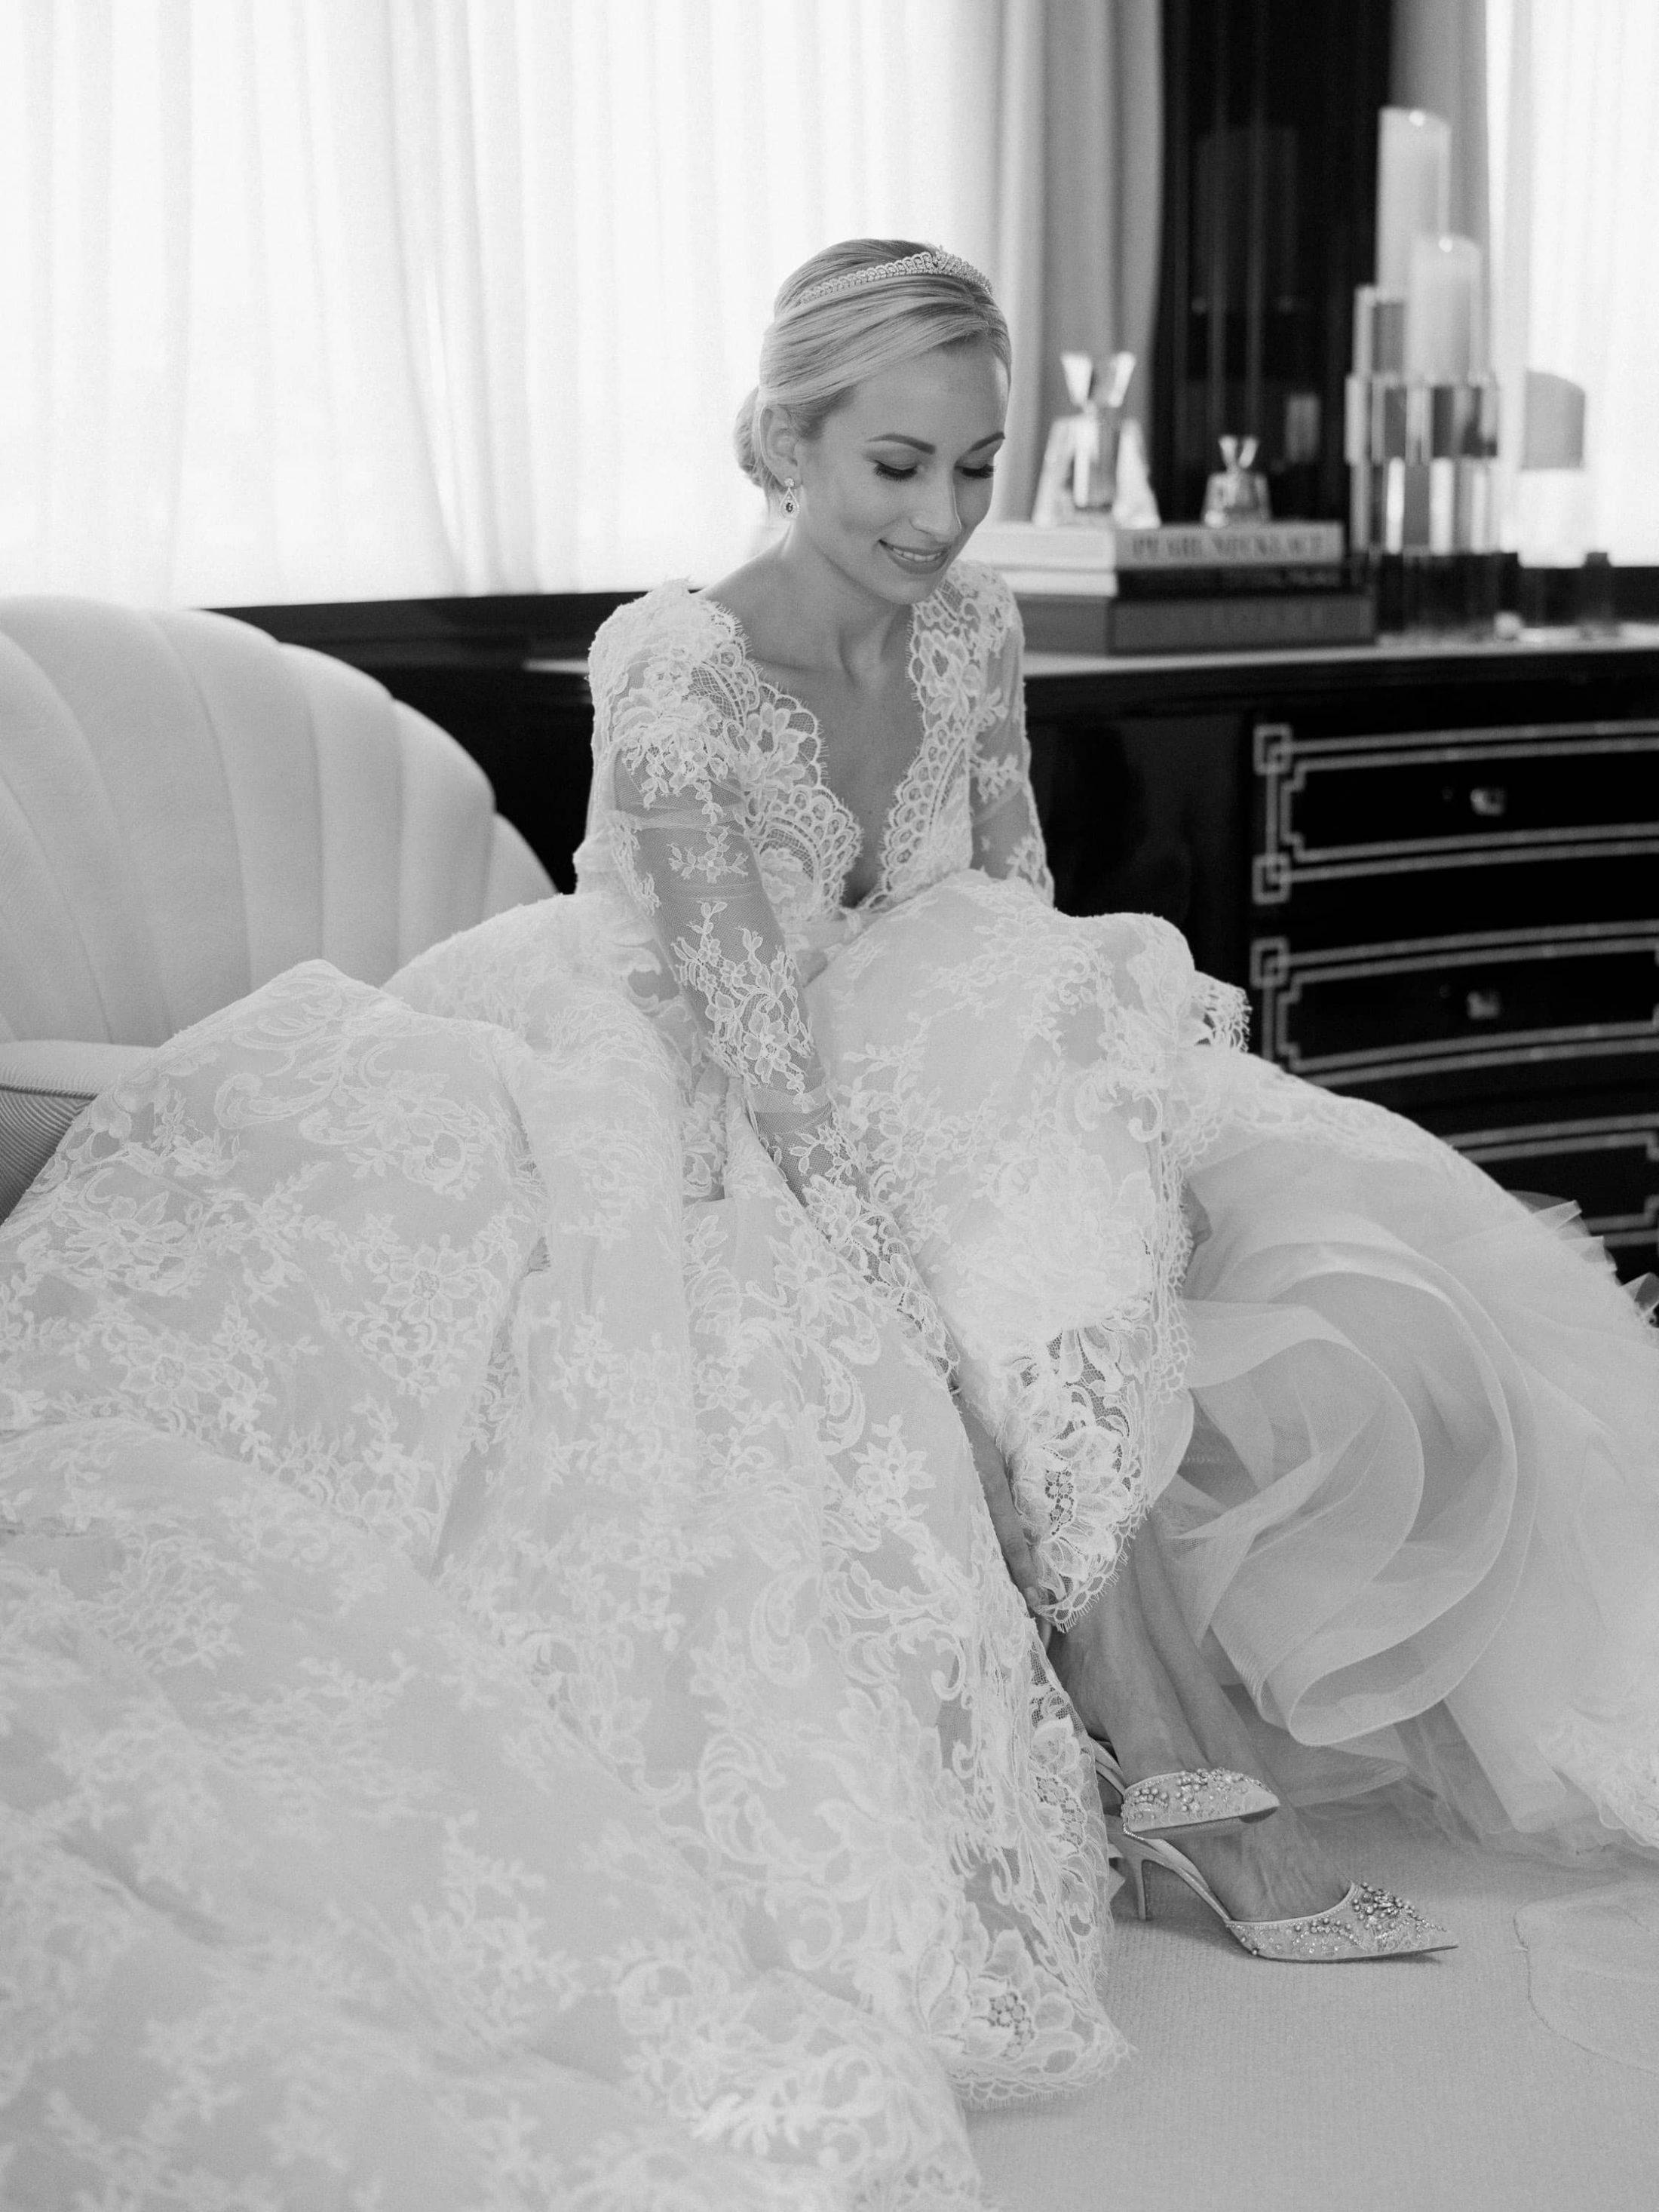 Bride getting ready at this Miami yacht wedding | Photo by Corbin Gurkin